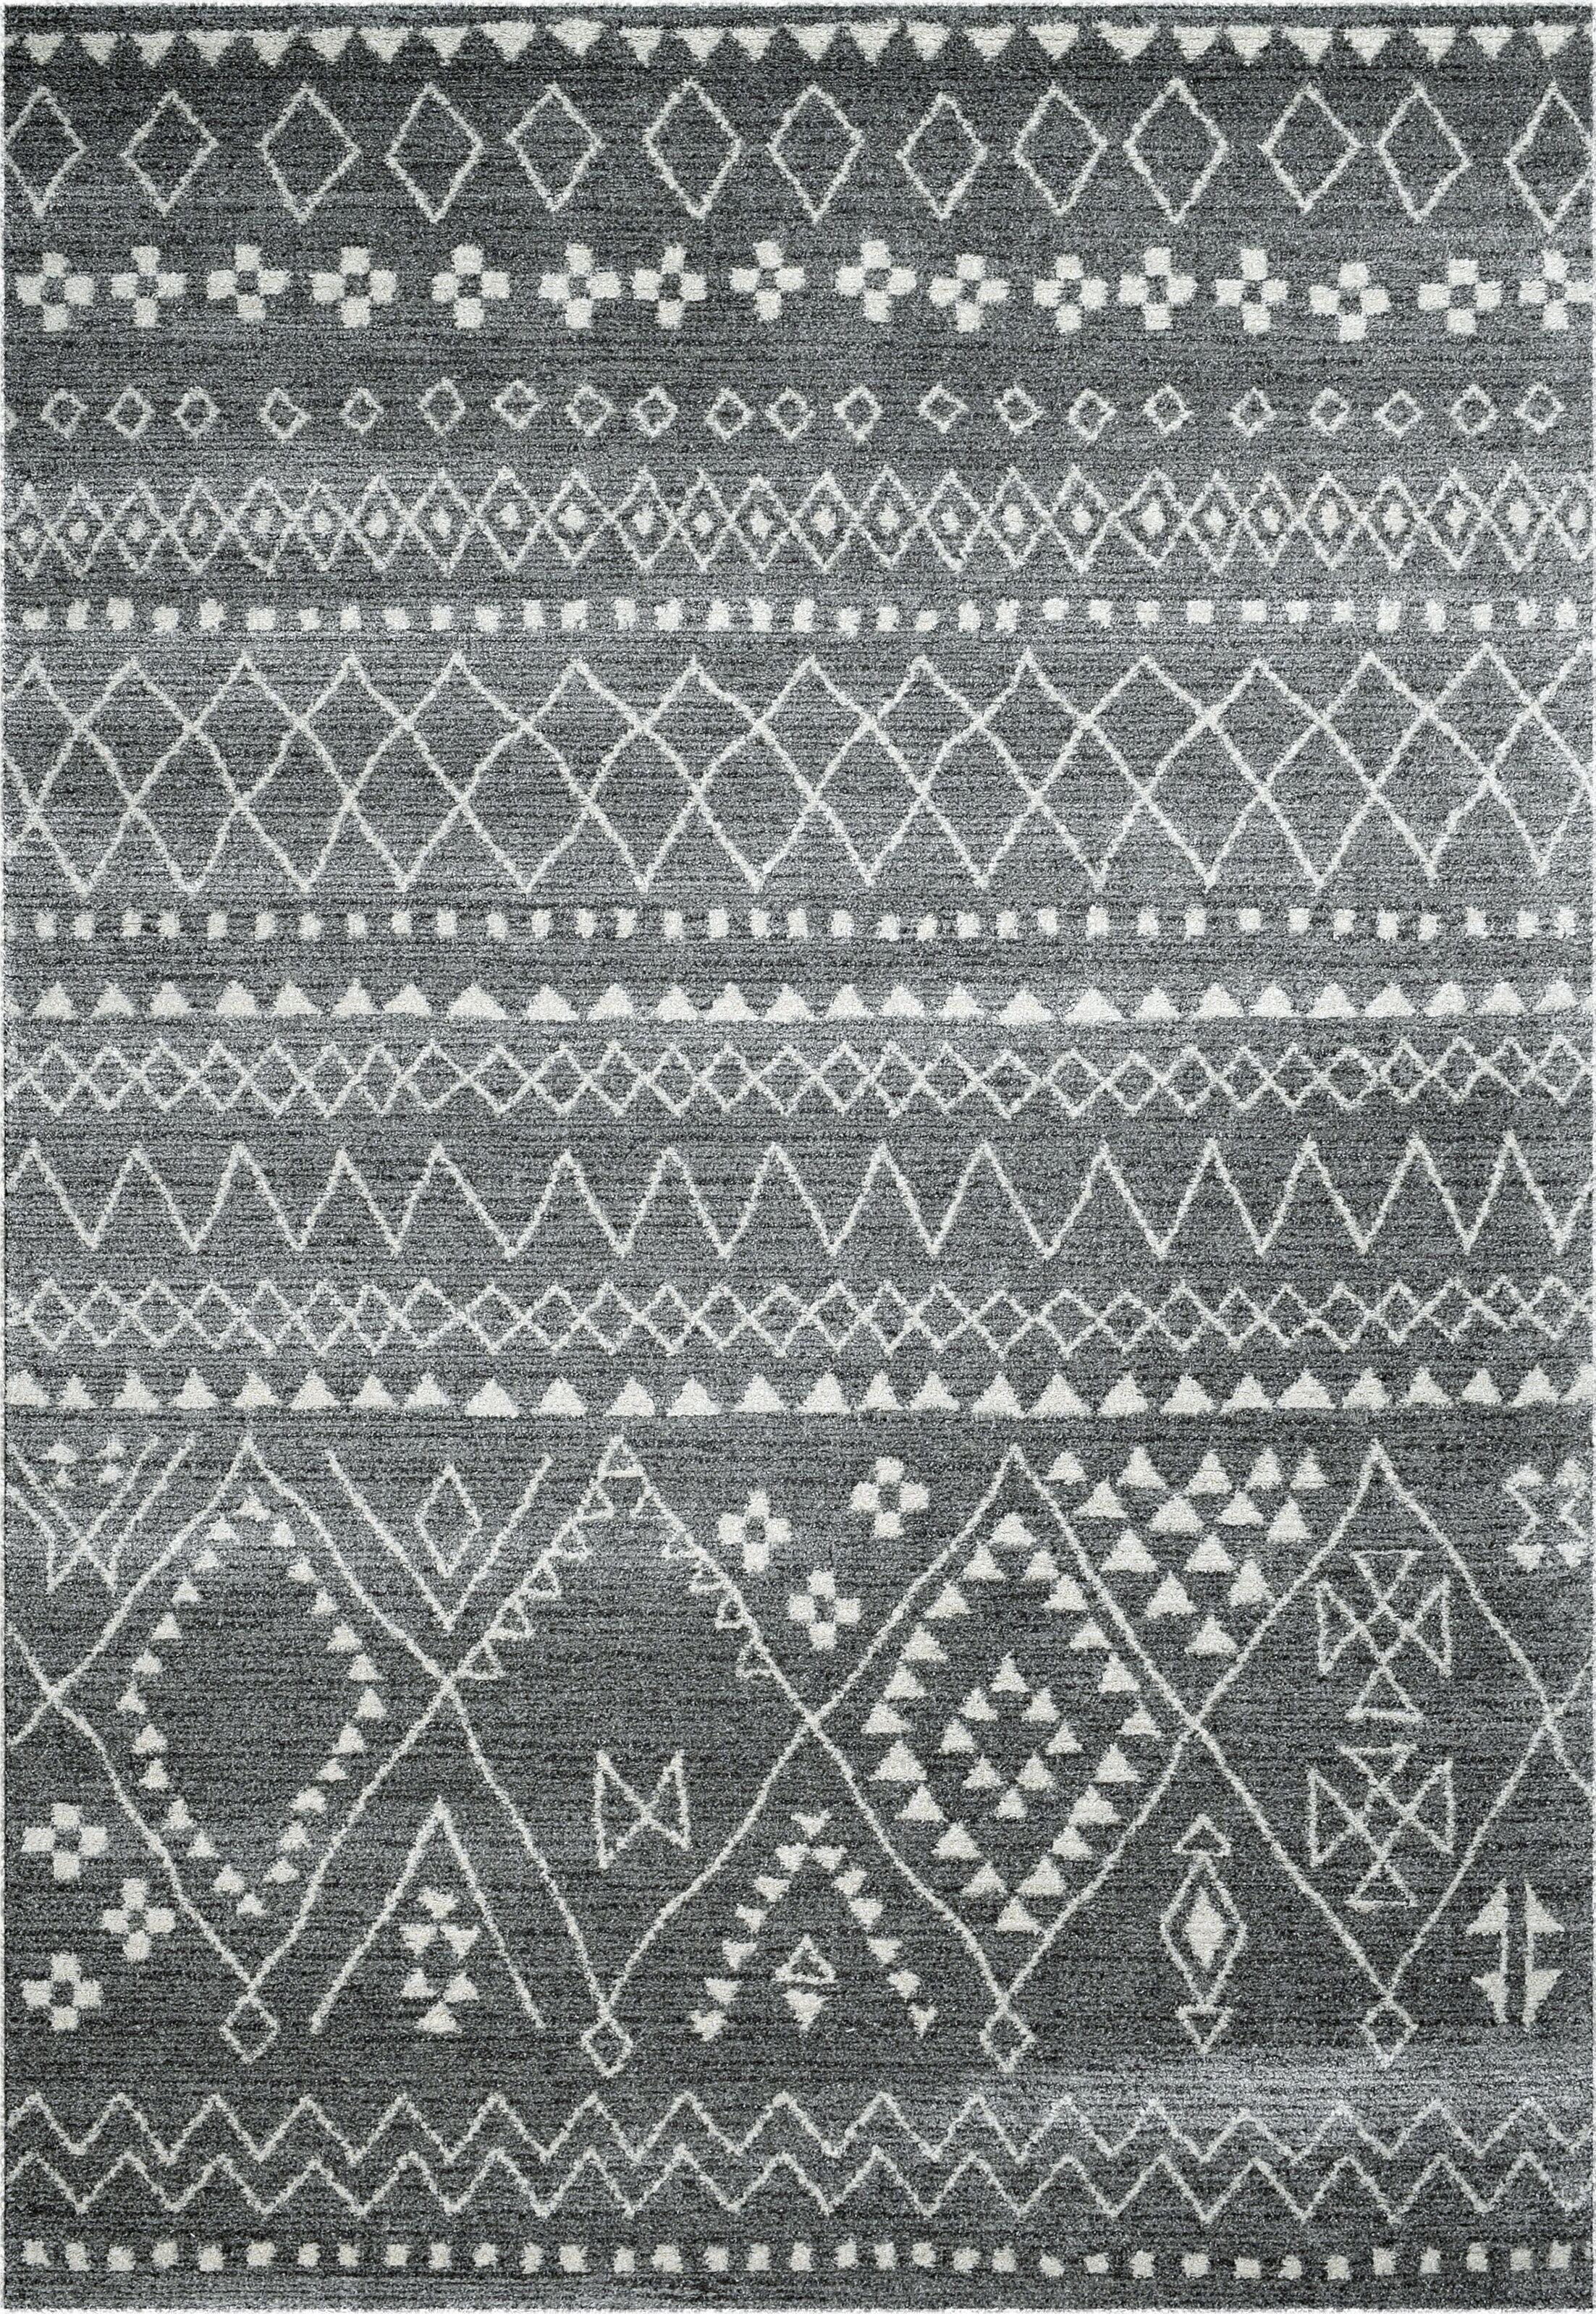 Pisano Gray/Ivory Area Rug Rug Size: Rectangle 6'7